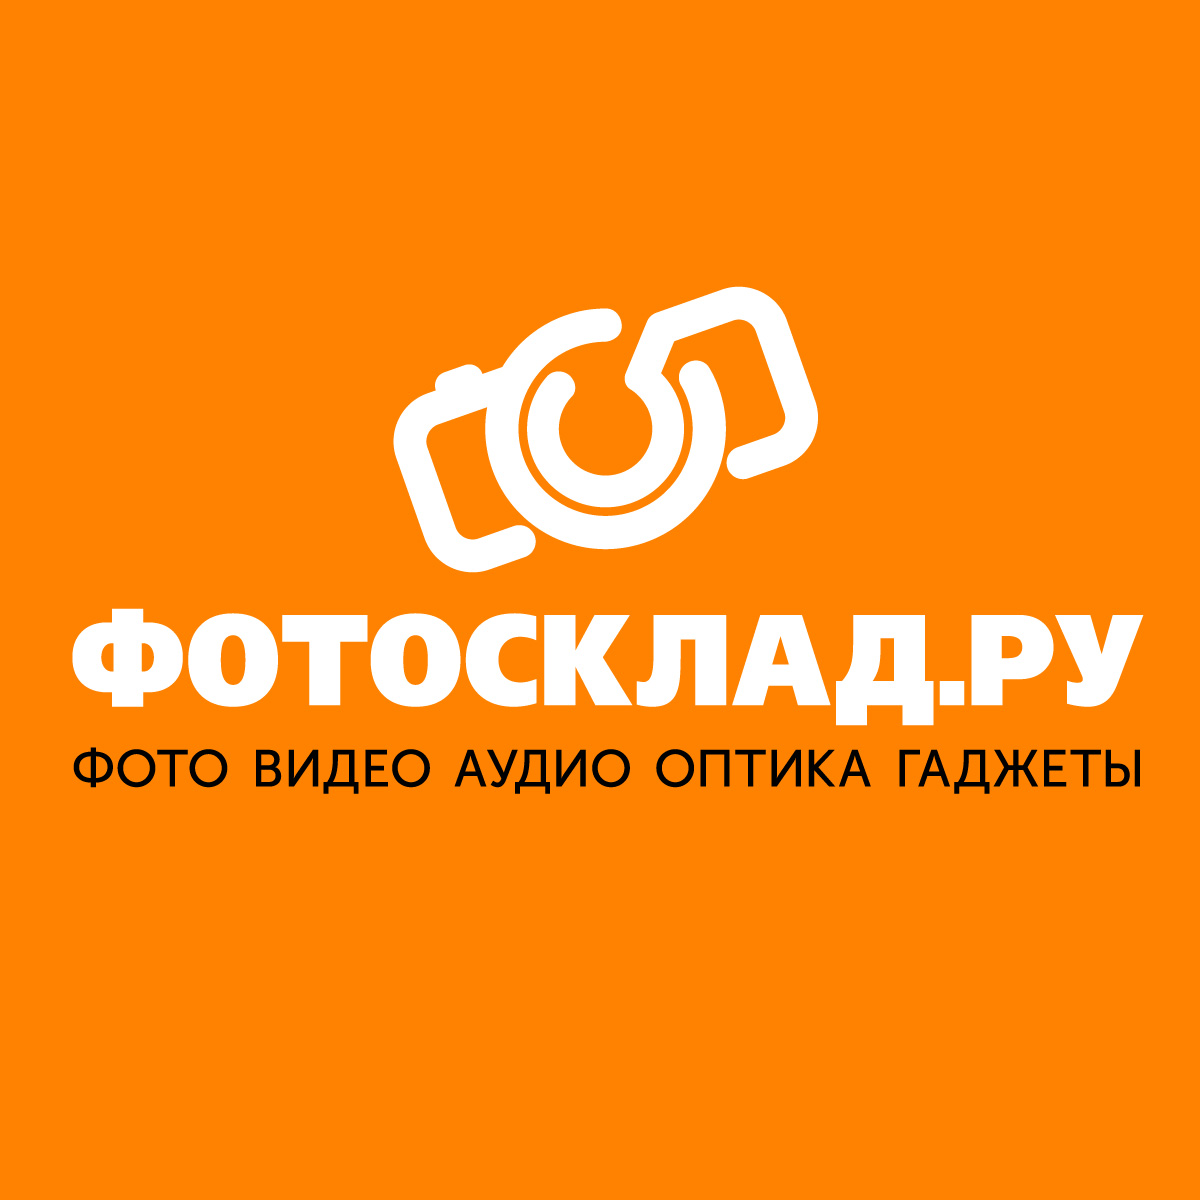 интернет магазин фотосклад